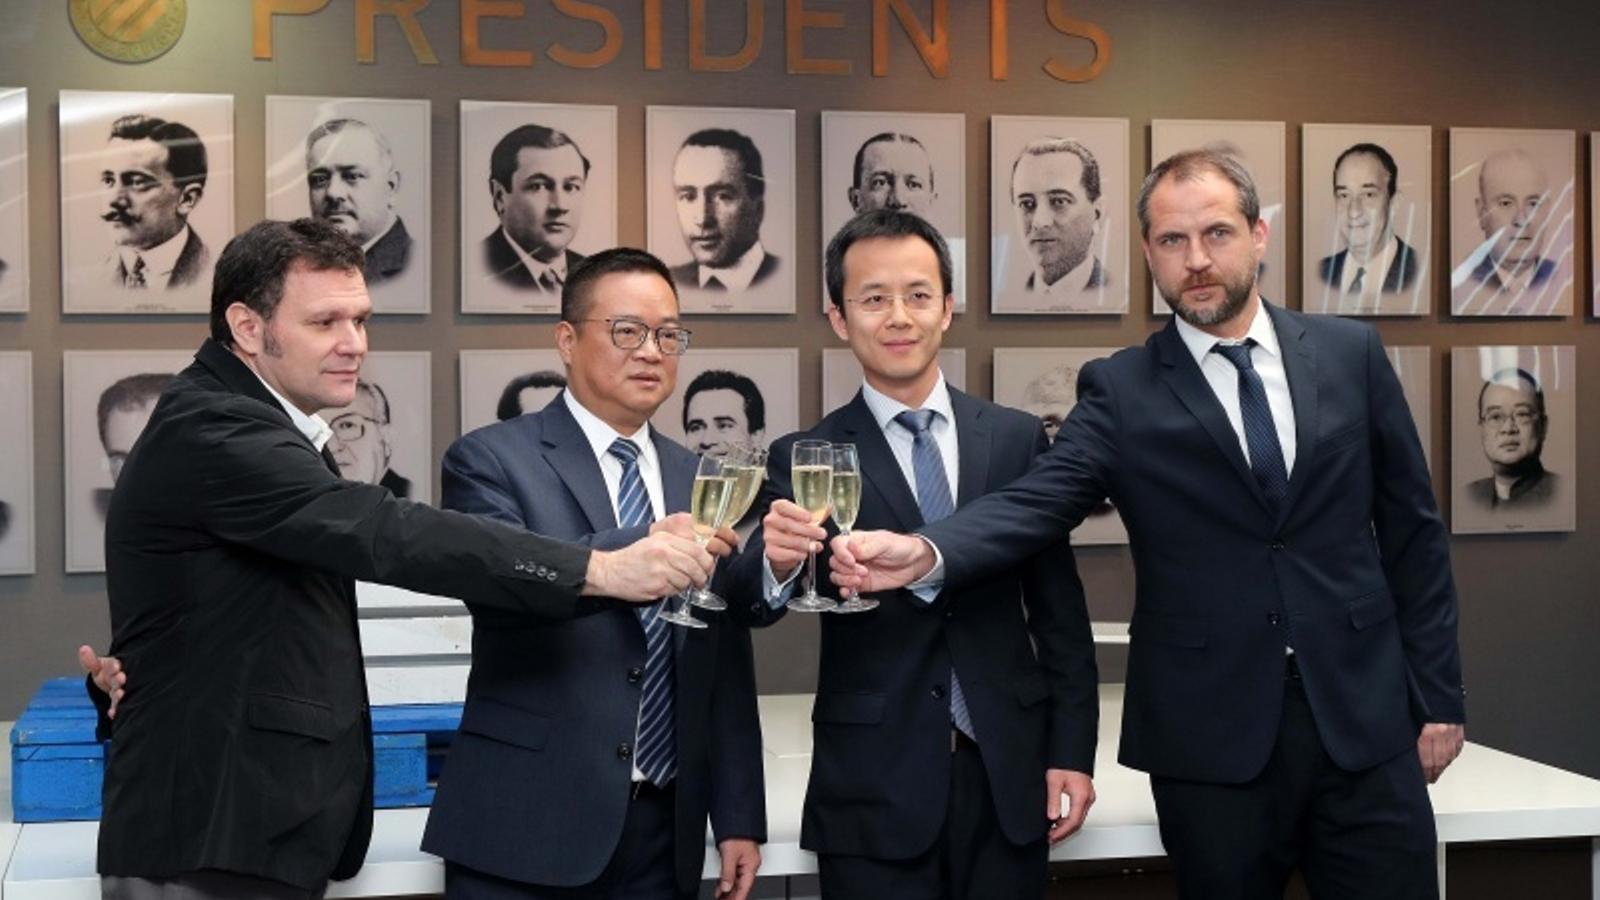 Roger Guasch, Chen Yansheng, Mao Ye Wu i Òscar Perarnau, brinden pel 2019